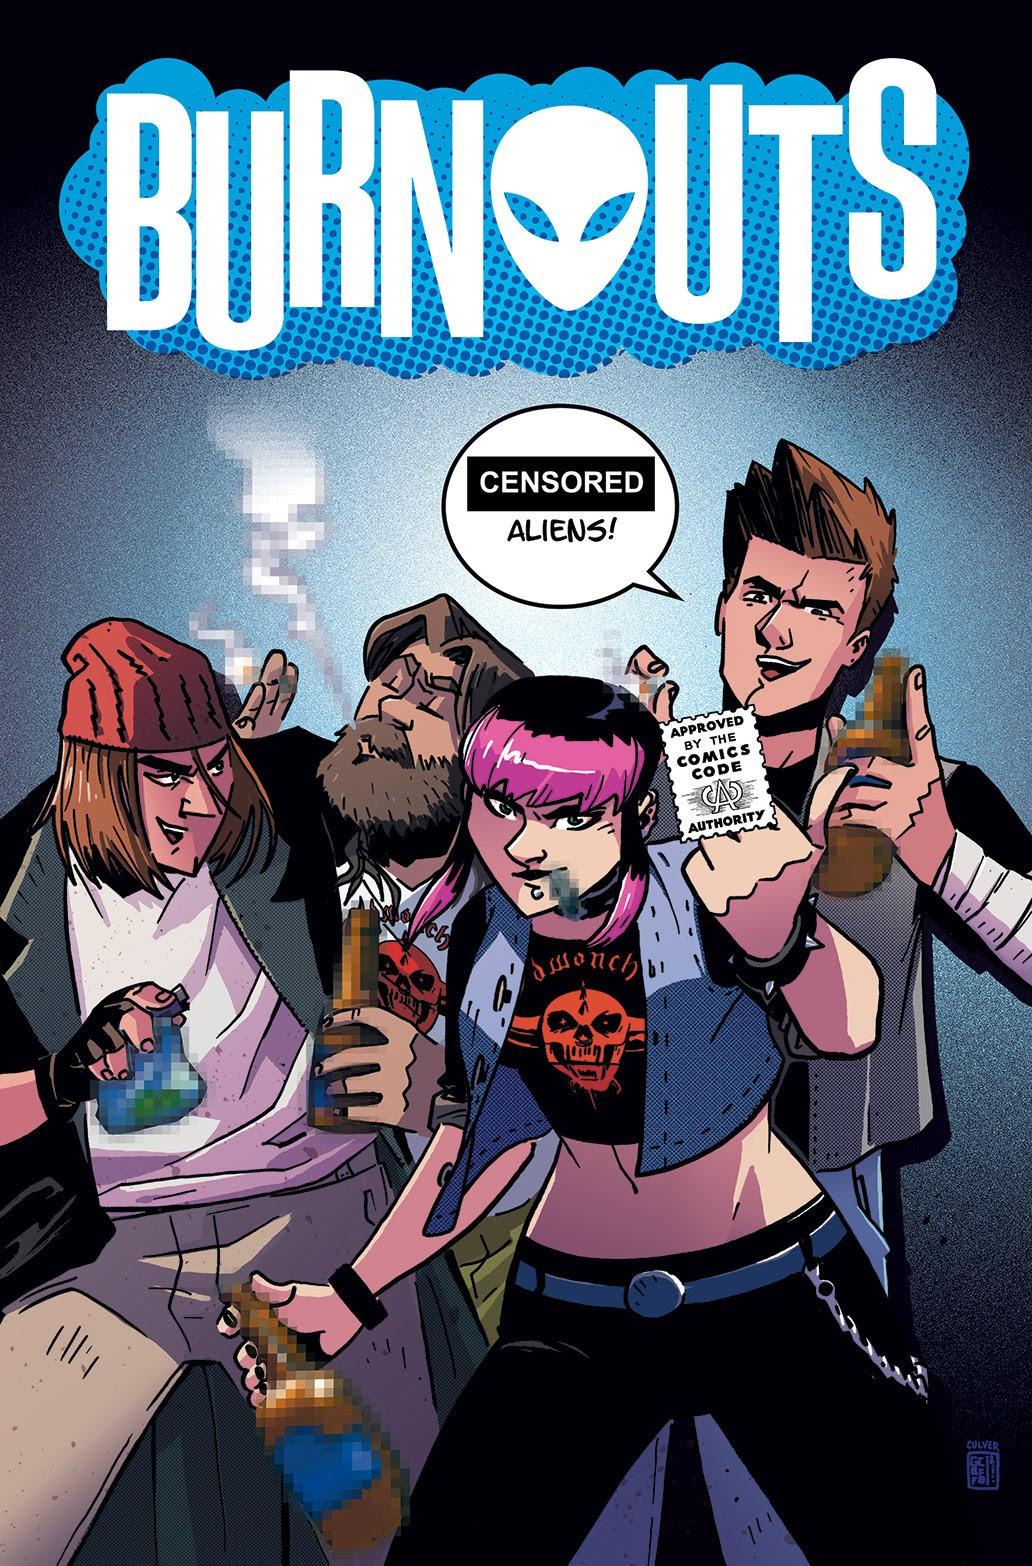 Burnouts-1-anti-censorship-variants.jpg